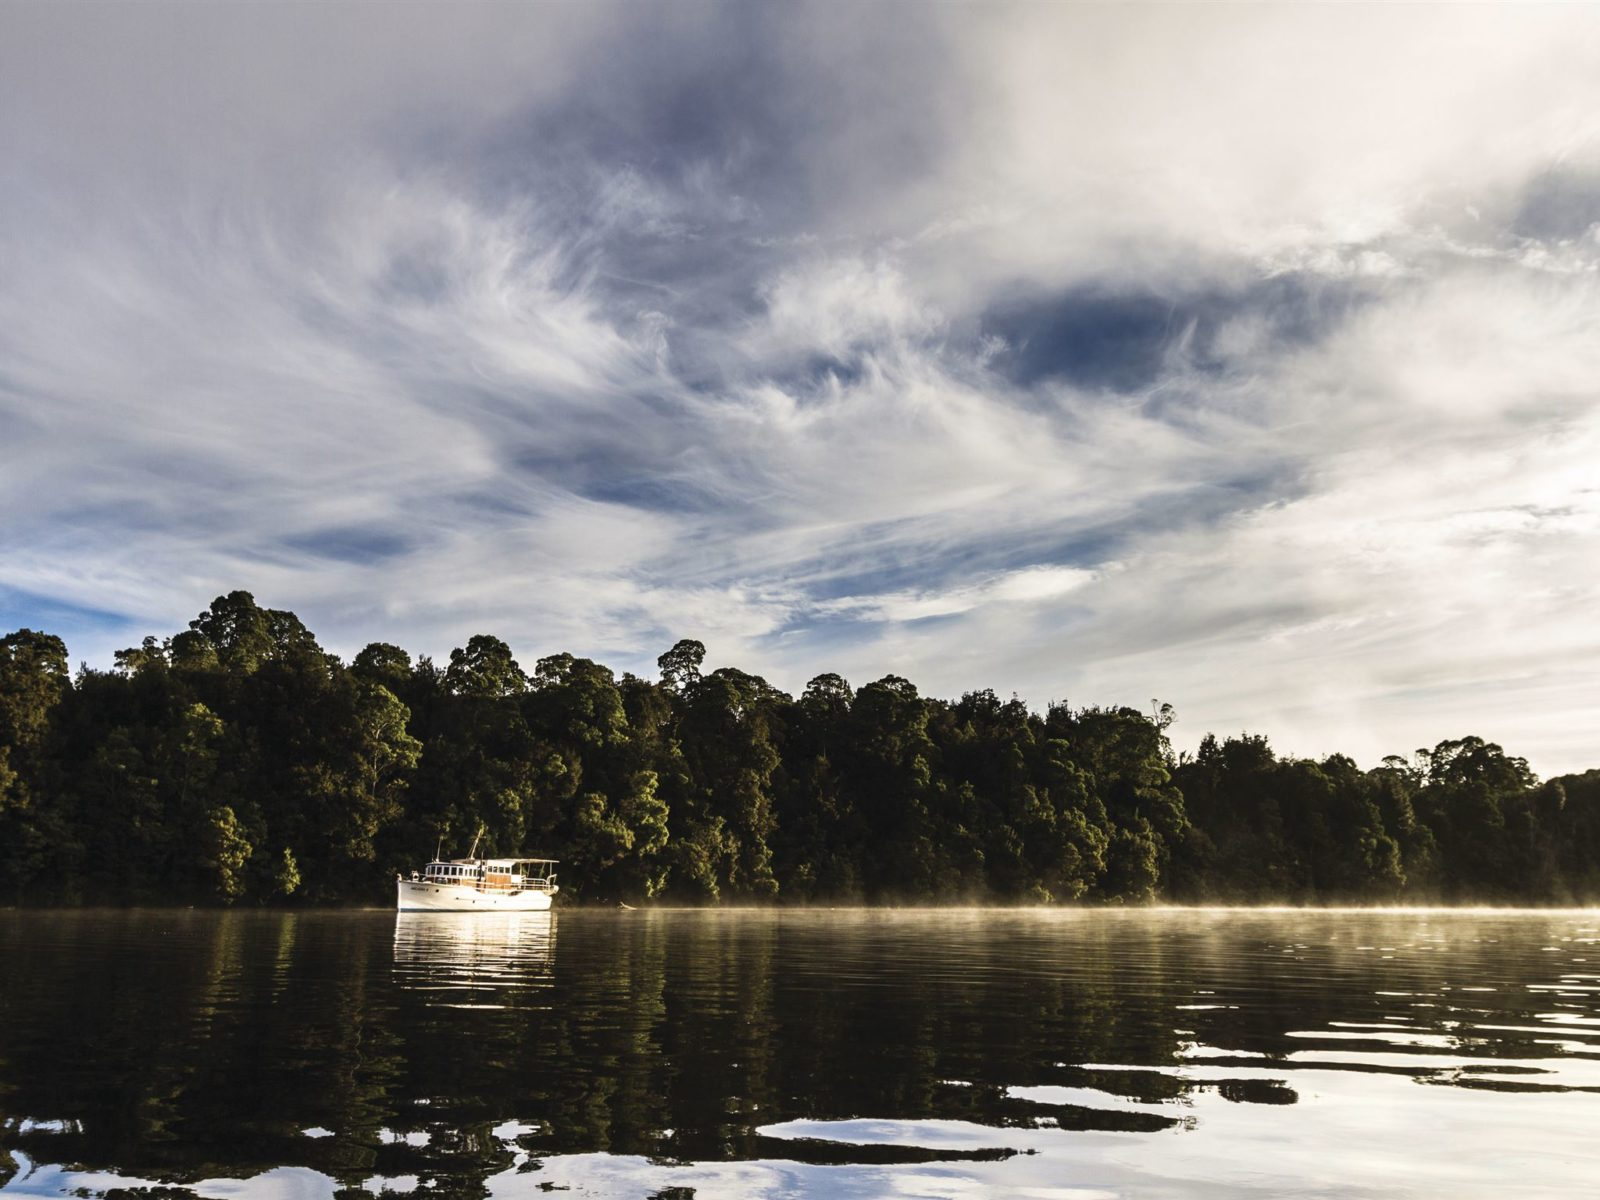 Arcadia II on the Pieman River